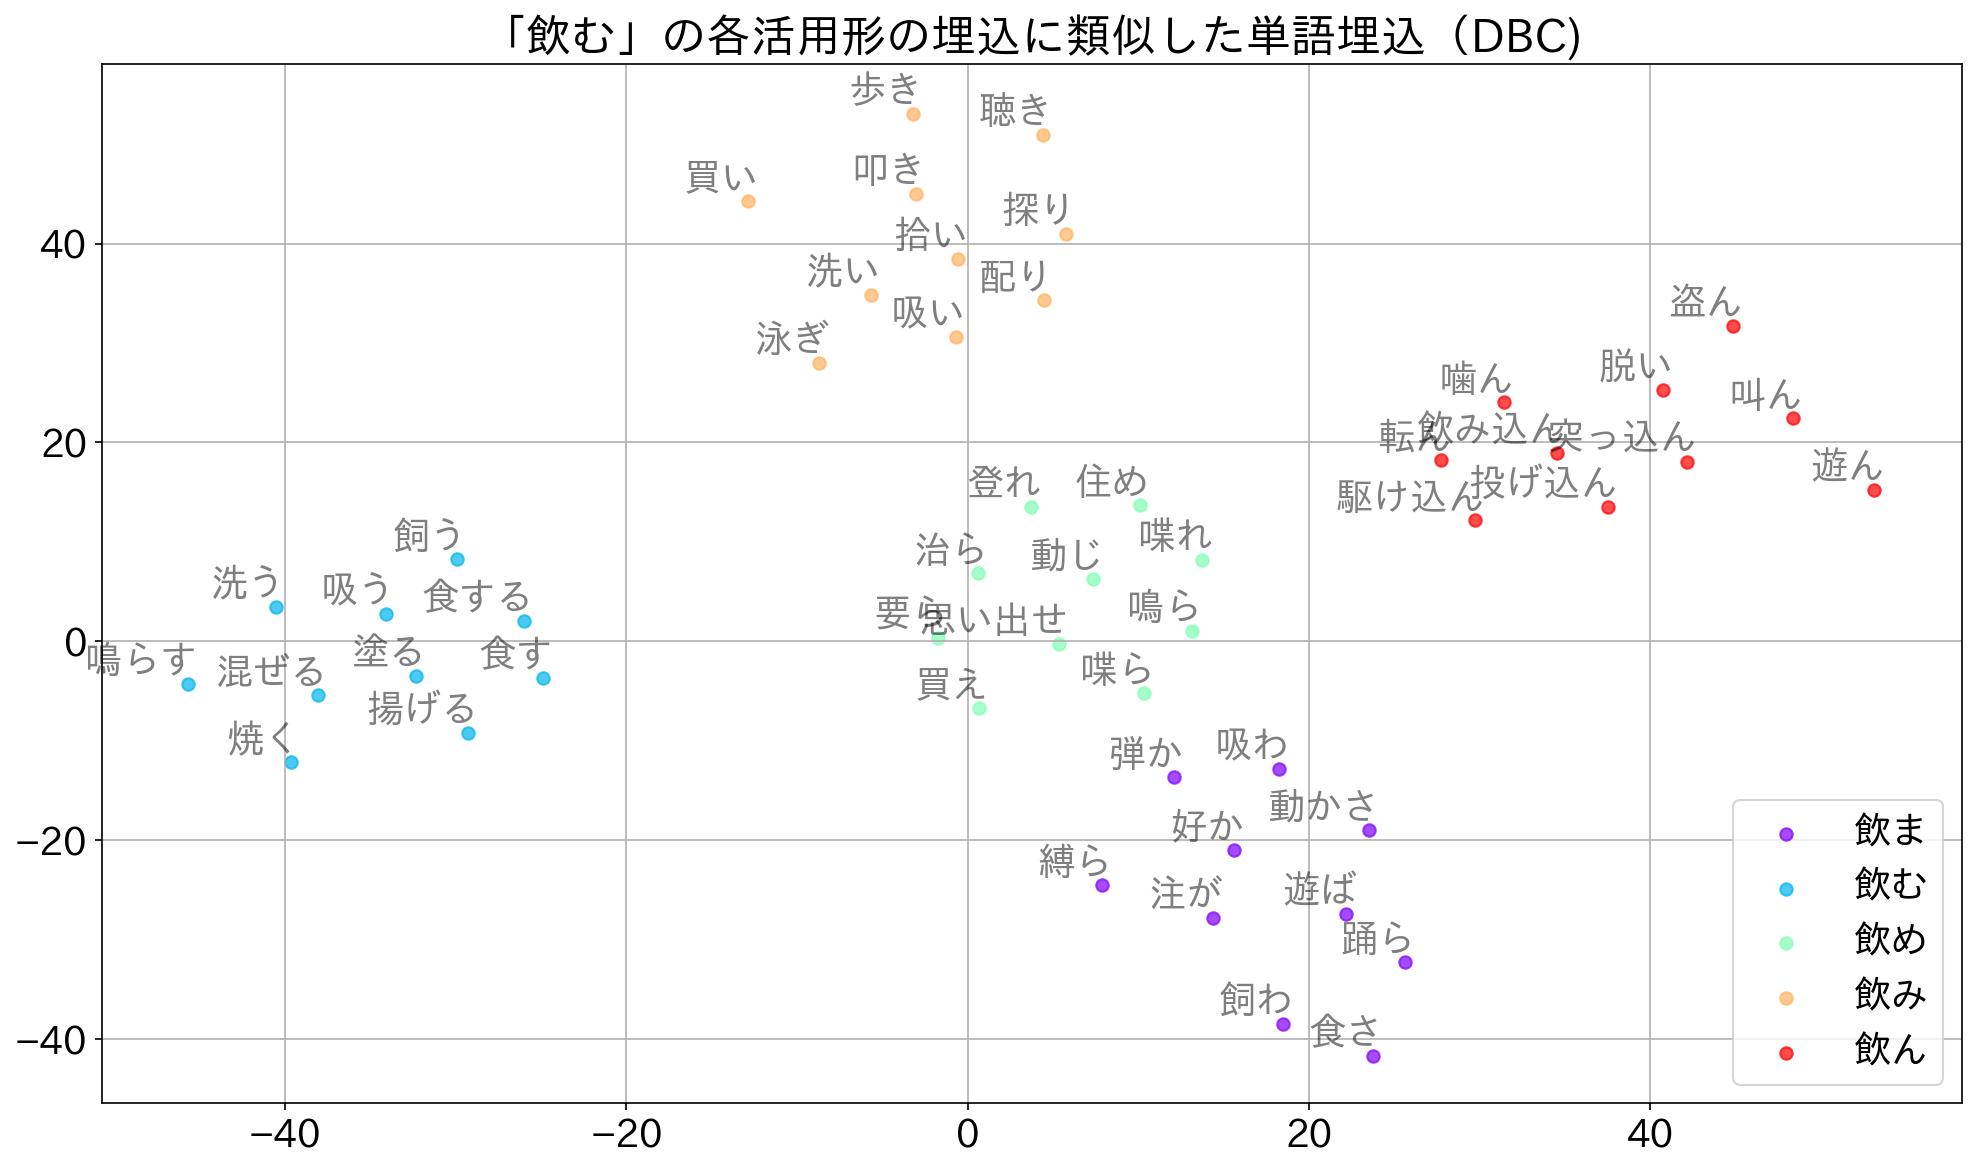 nomu_dep.png (219.6 kB)